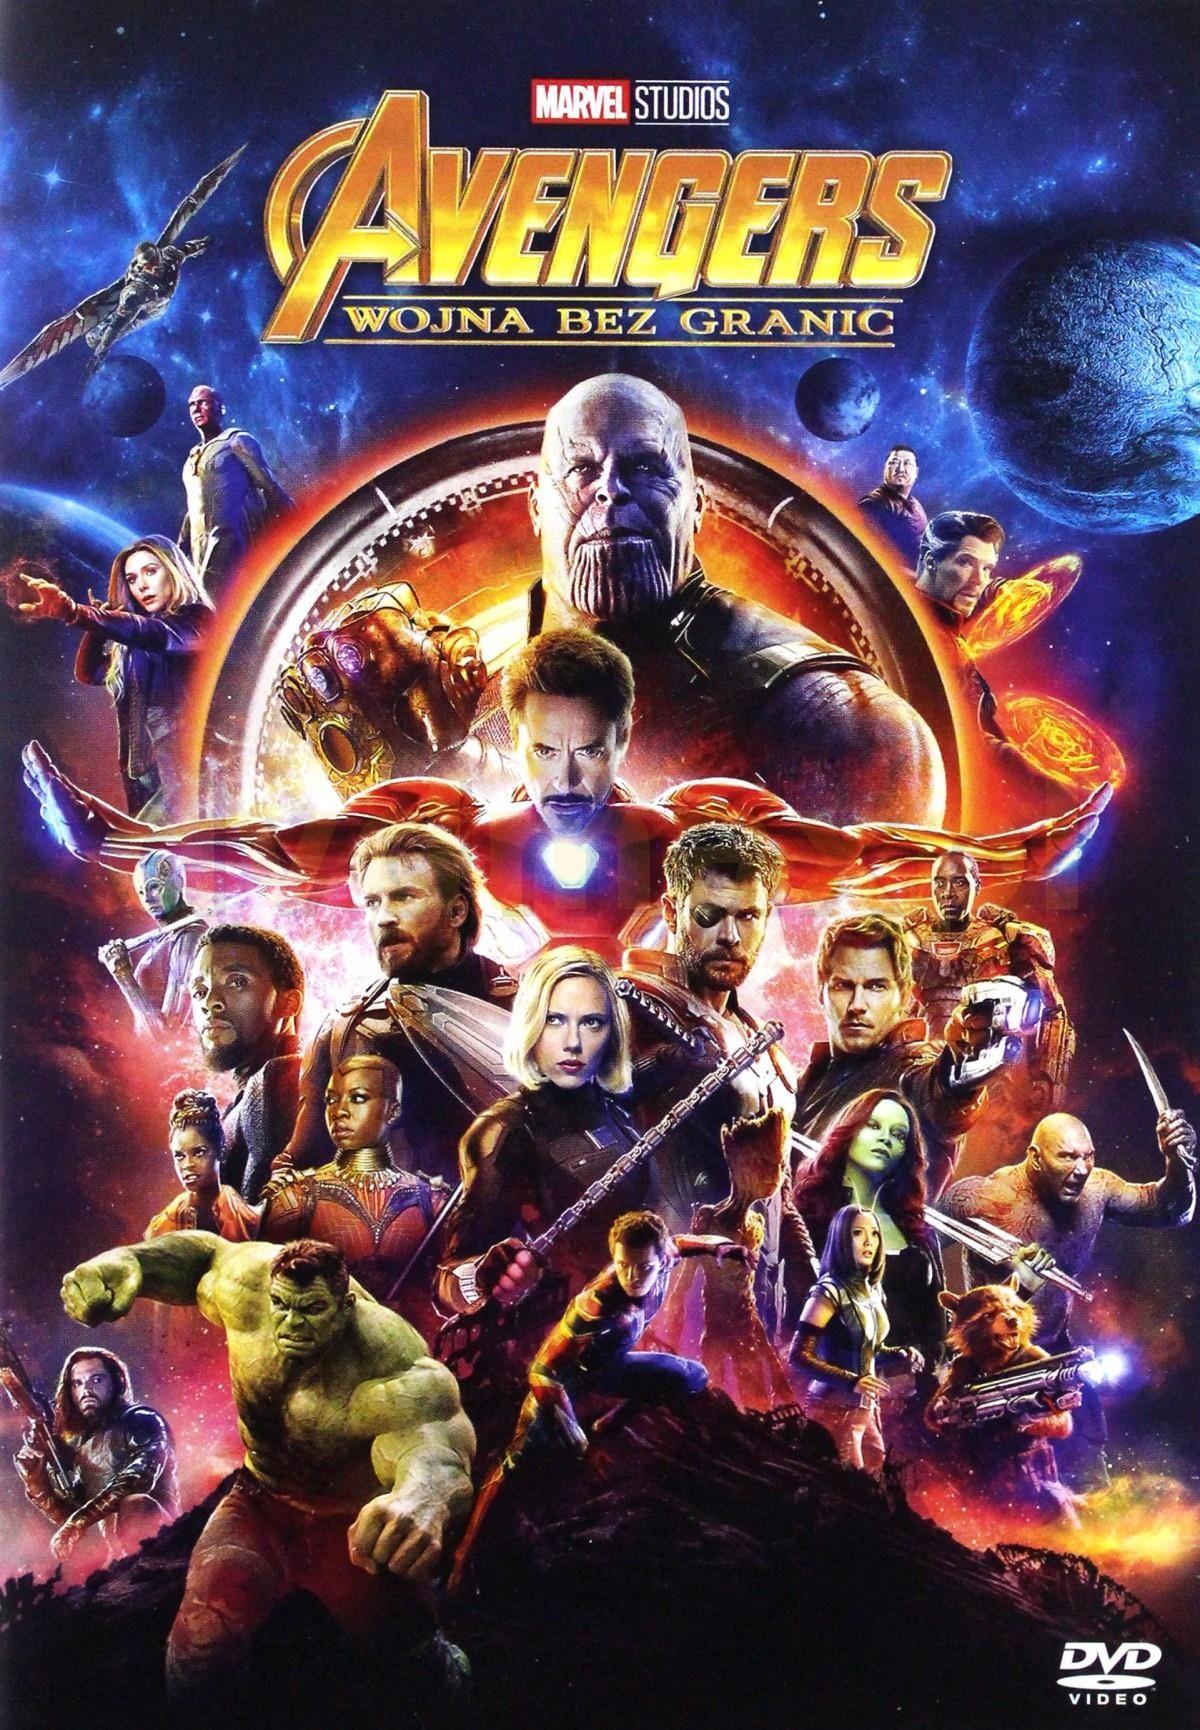 Avengers: Wojna bez granic - Avengers: Infinity War *2018* [720p] [BluRay] [x264] [AC3-KiT] [Lektor PL]